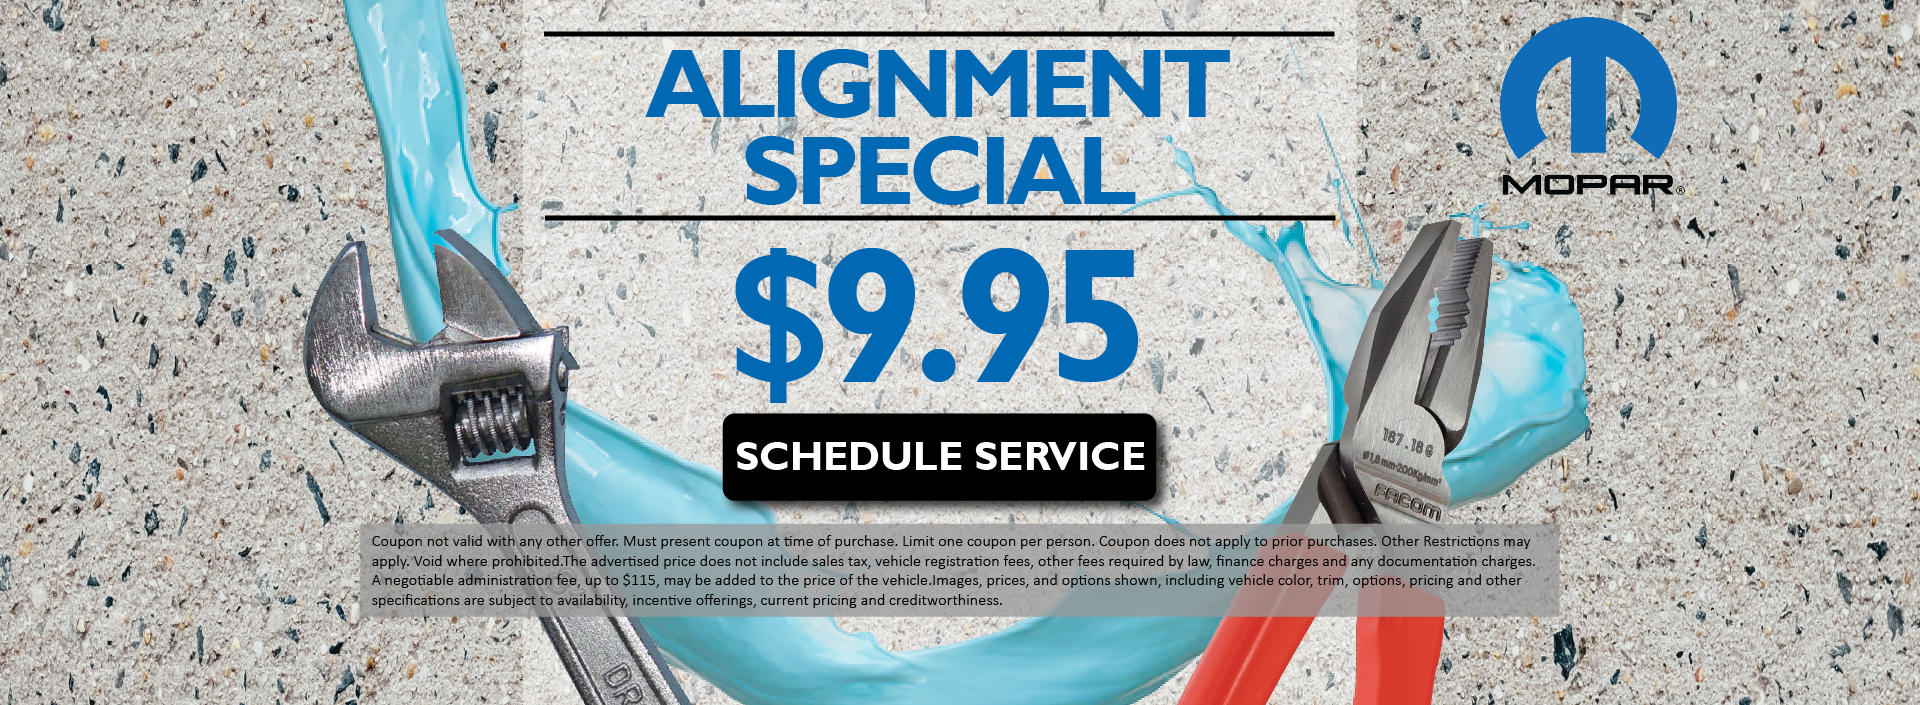 Alignment Special $9.95